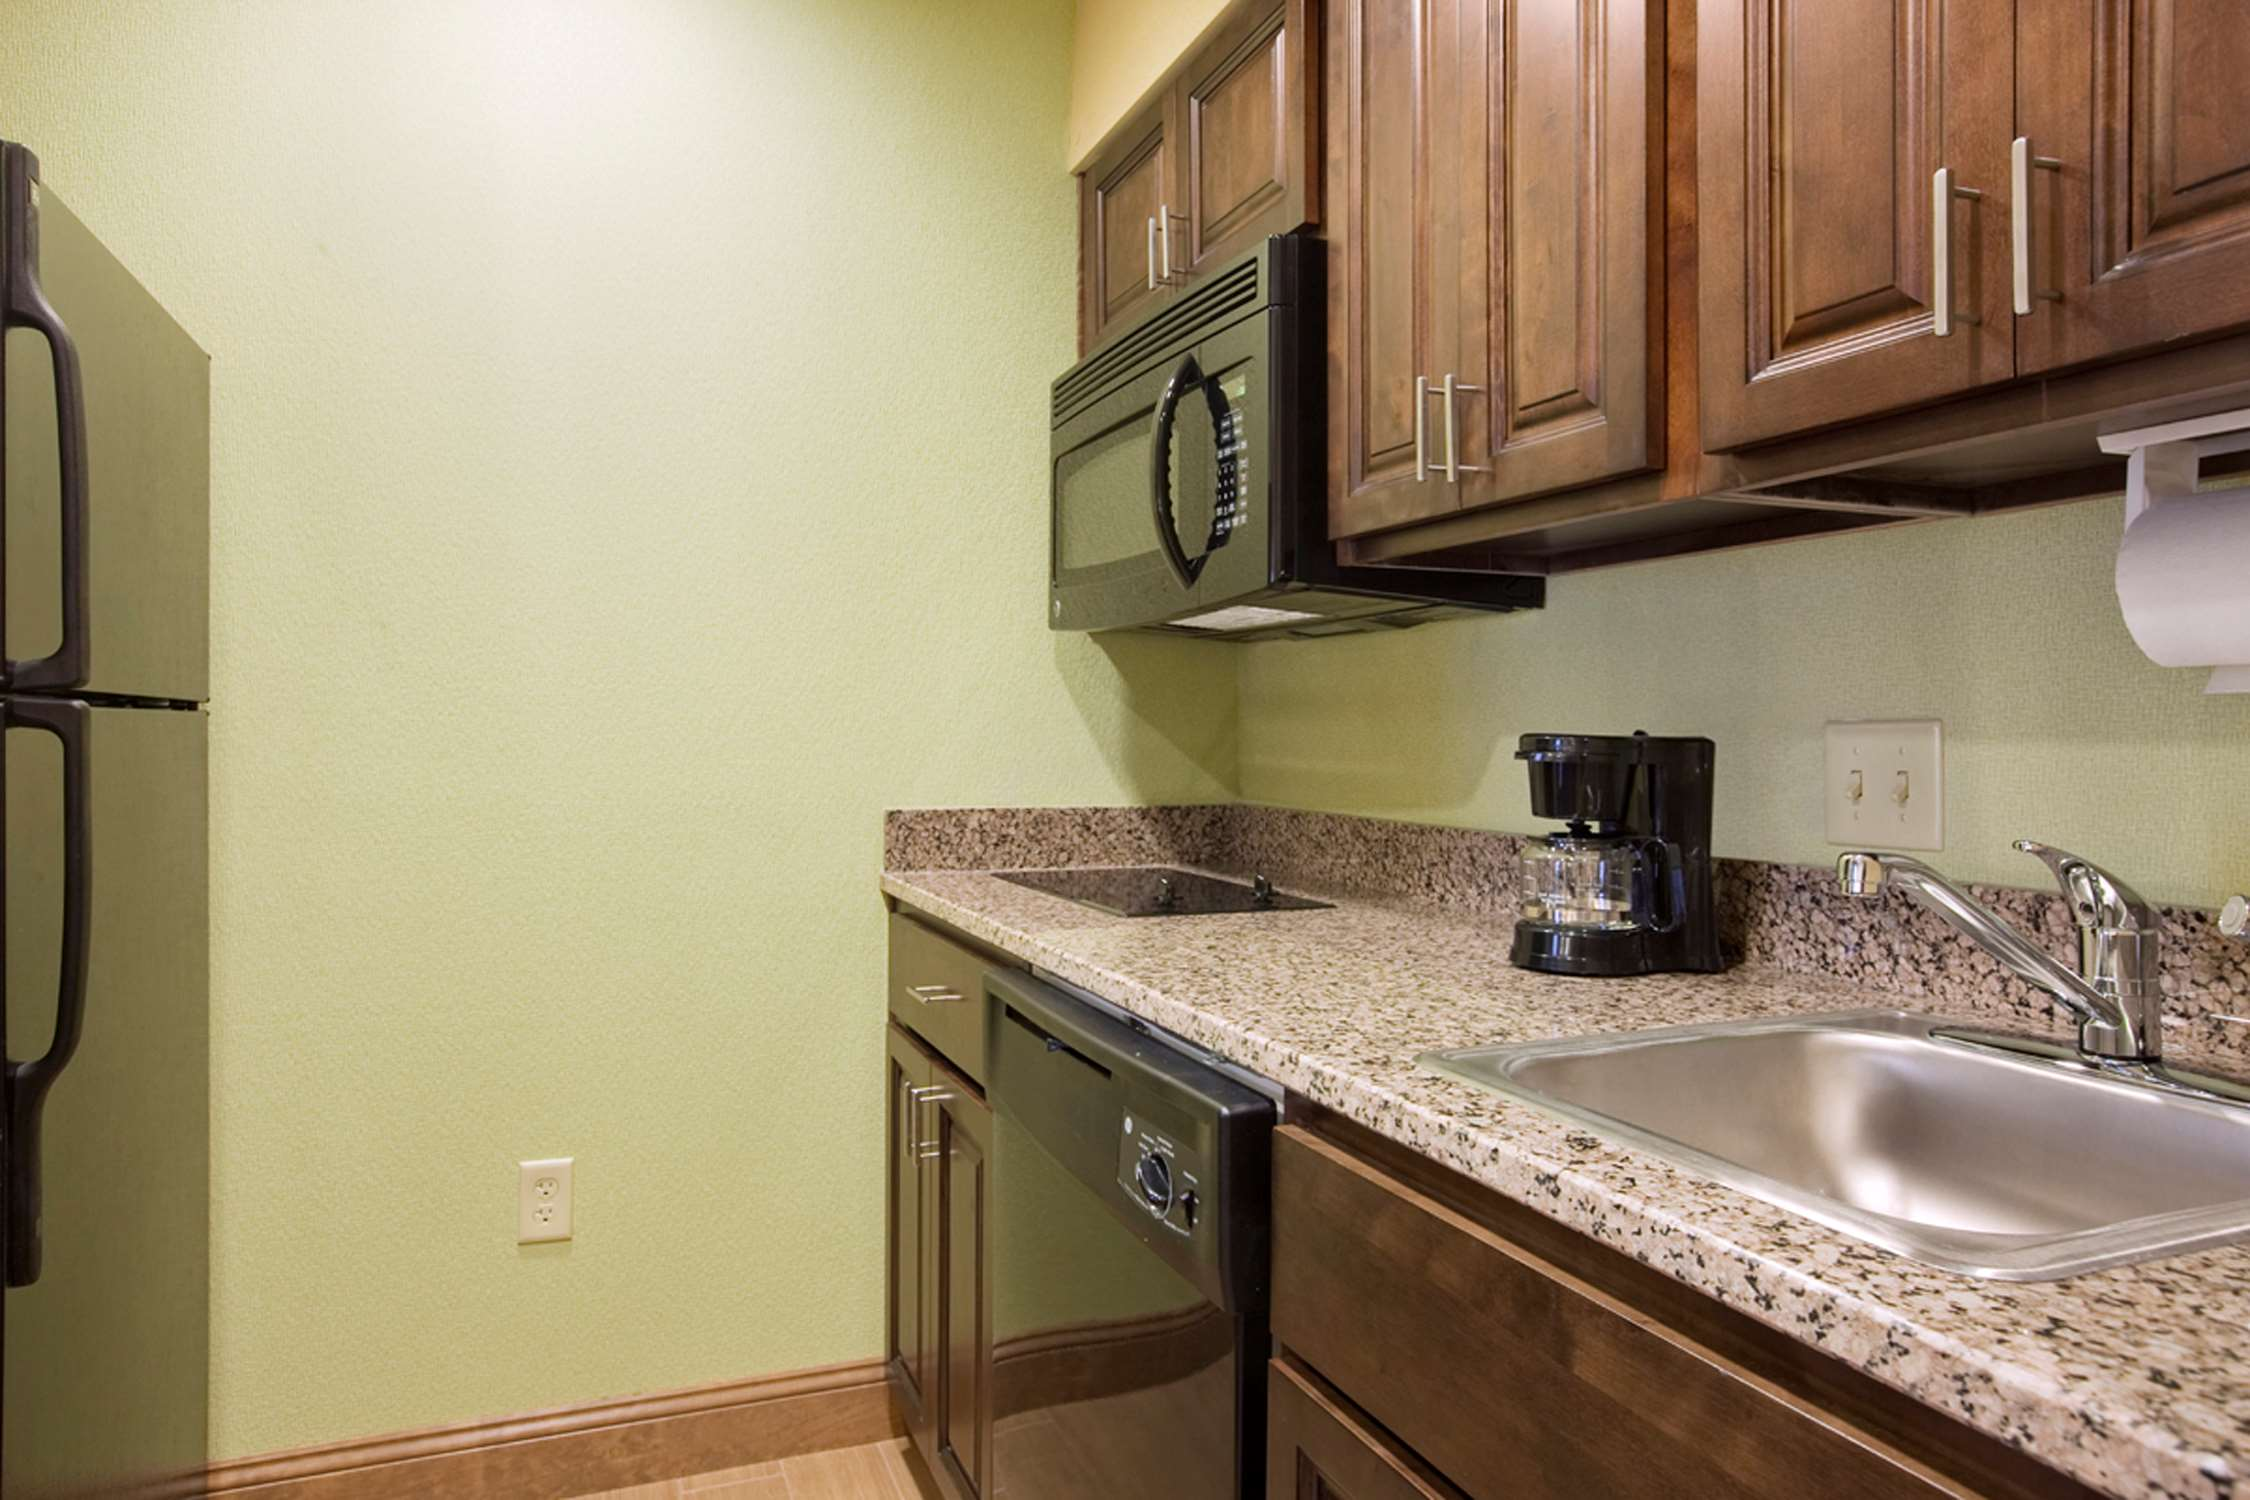 Homewood Suites by Hilton Charlotte/Ayrsley, NC image 9